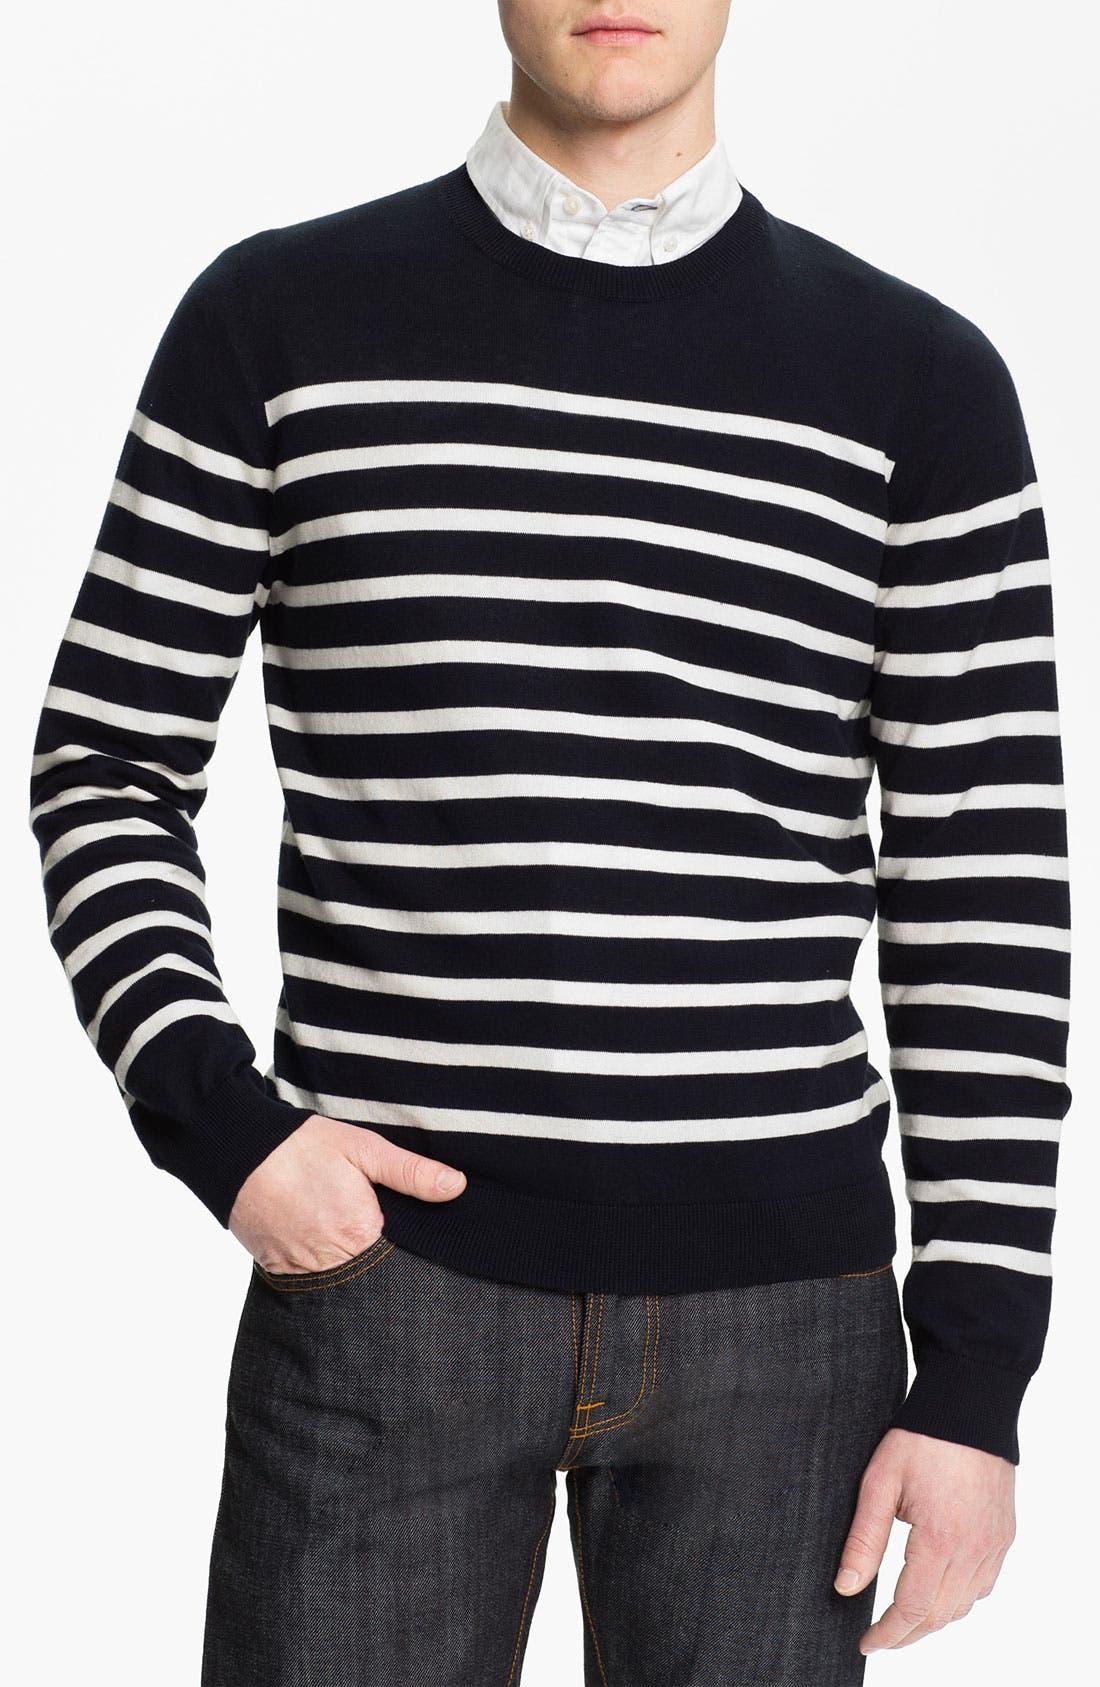 Alternate Image 1 Selected - Wallin & Bros. 'Drayton Stripe' Crewneck Sweater